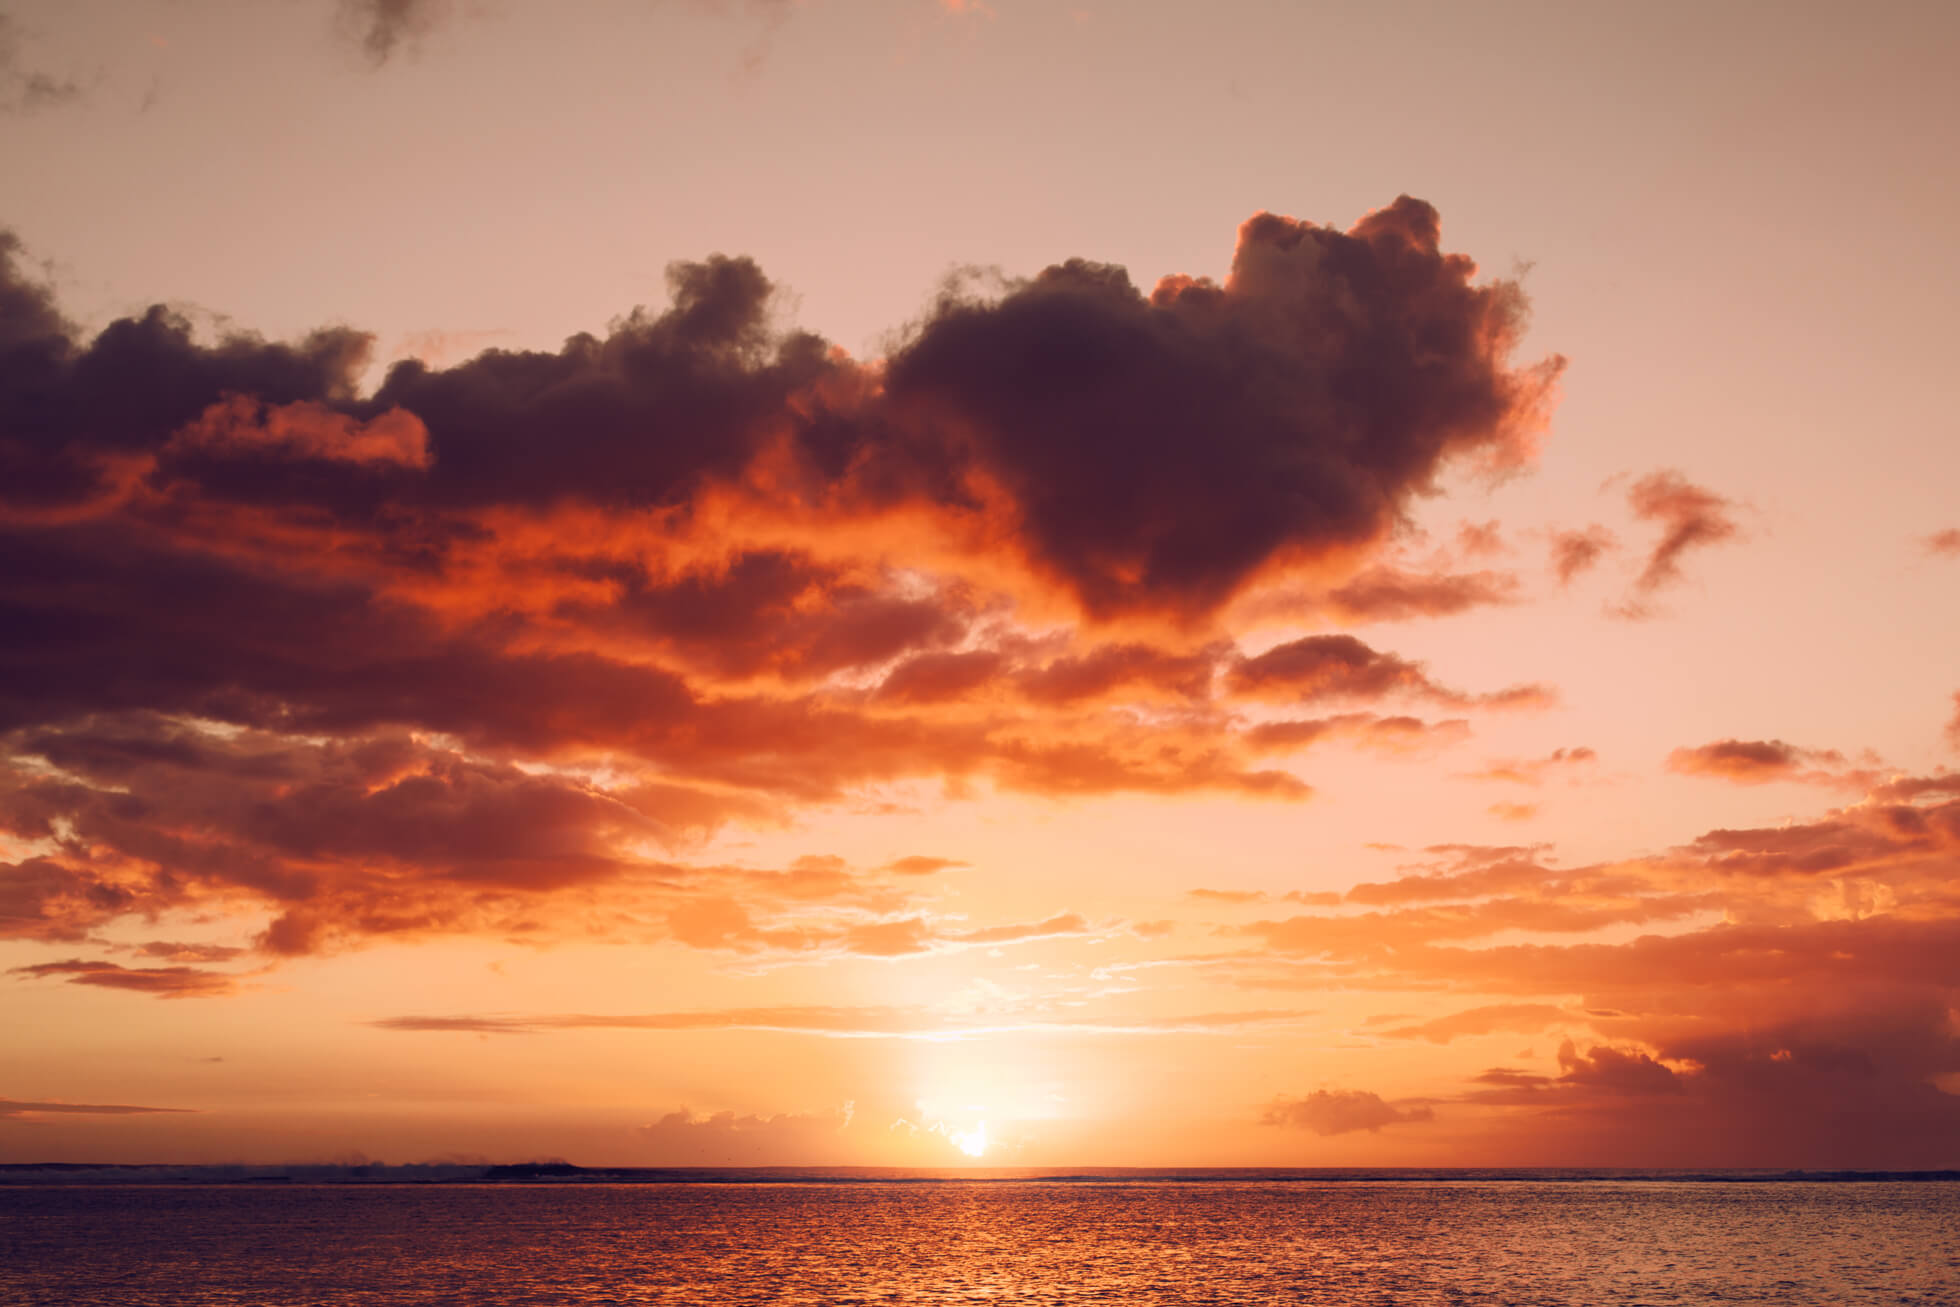 4_MG_8813-Edit - Mauritius sunset by Fabian Wester_